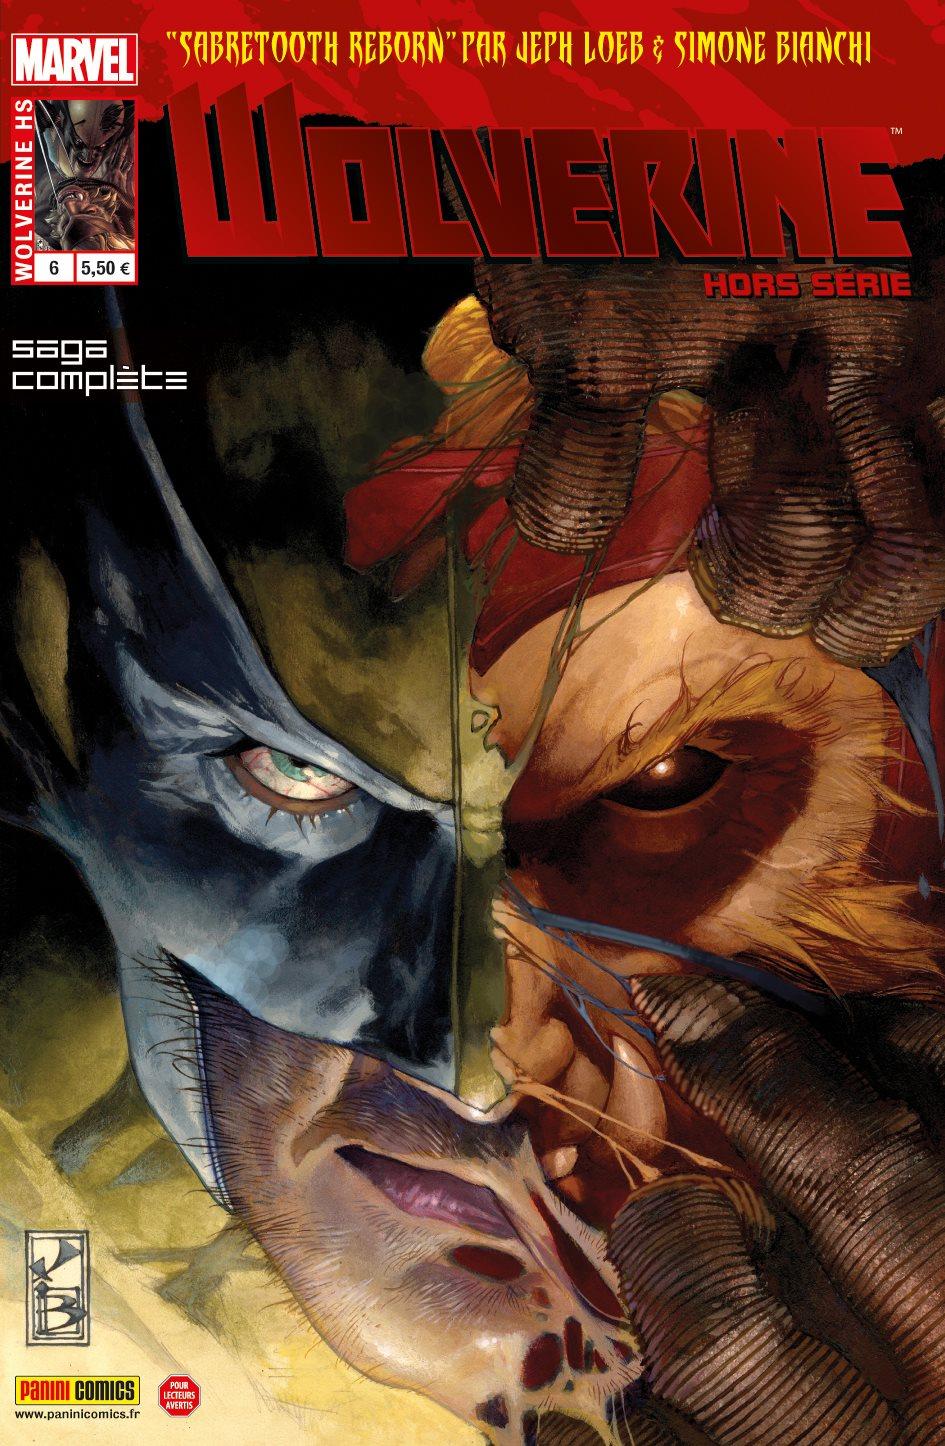 Wolverine (revue) – Hors série, T6 : Dents de Sabre : Renaissance (0), comics chez Panini Comics de Simmons, Loeb, Ryan, Bianchi, Morales, Olazaba, Keith, Peruzzi, Hollowell, Martinez, Guru efx